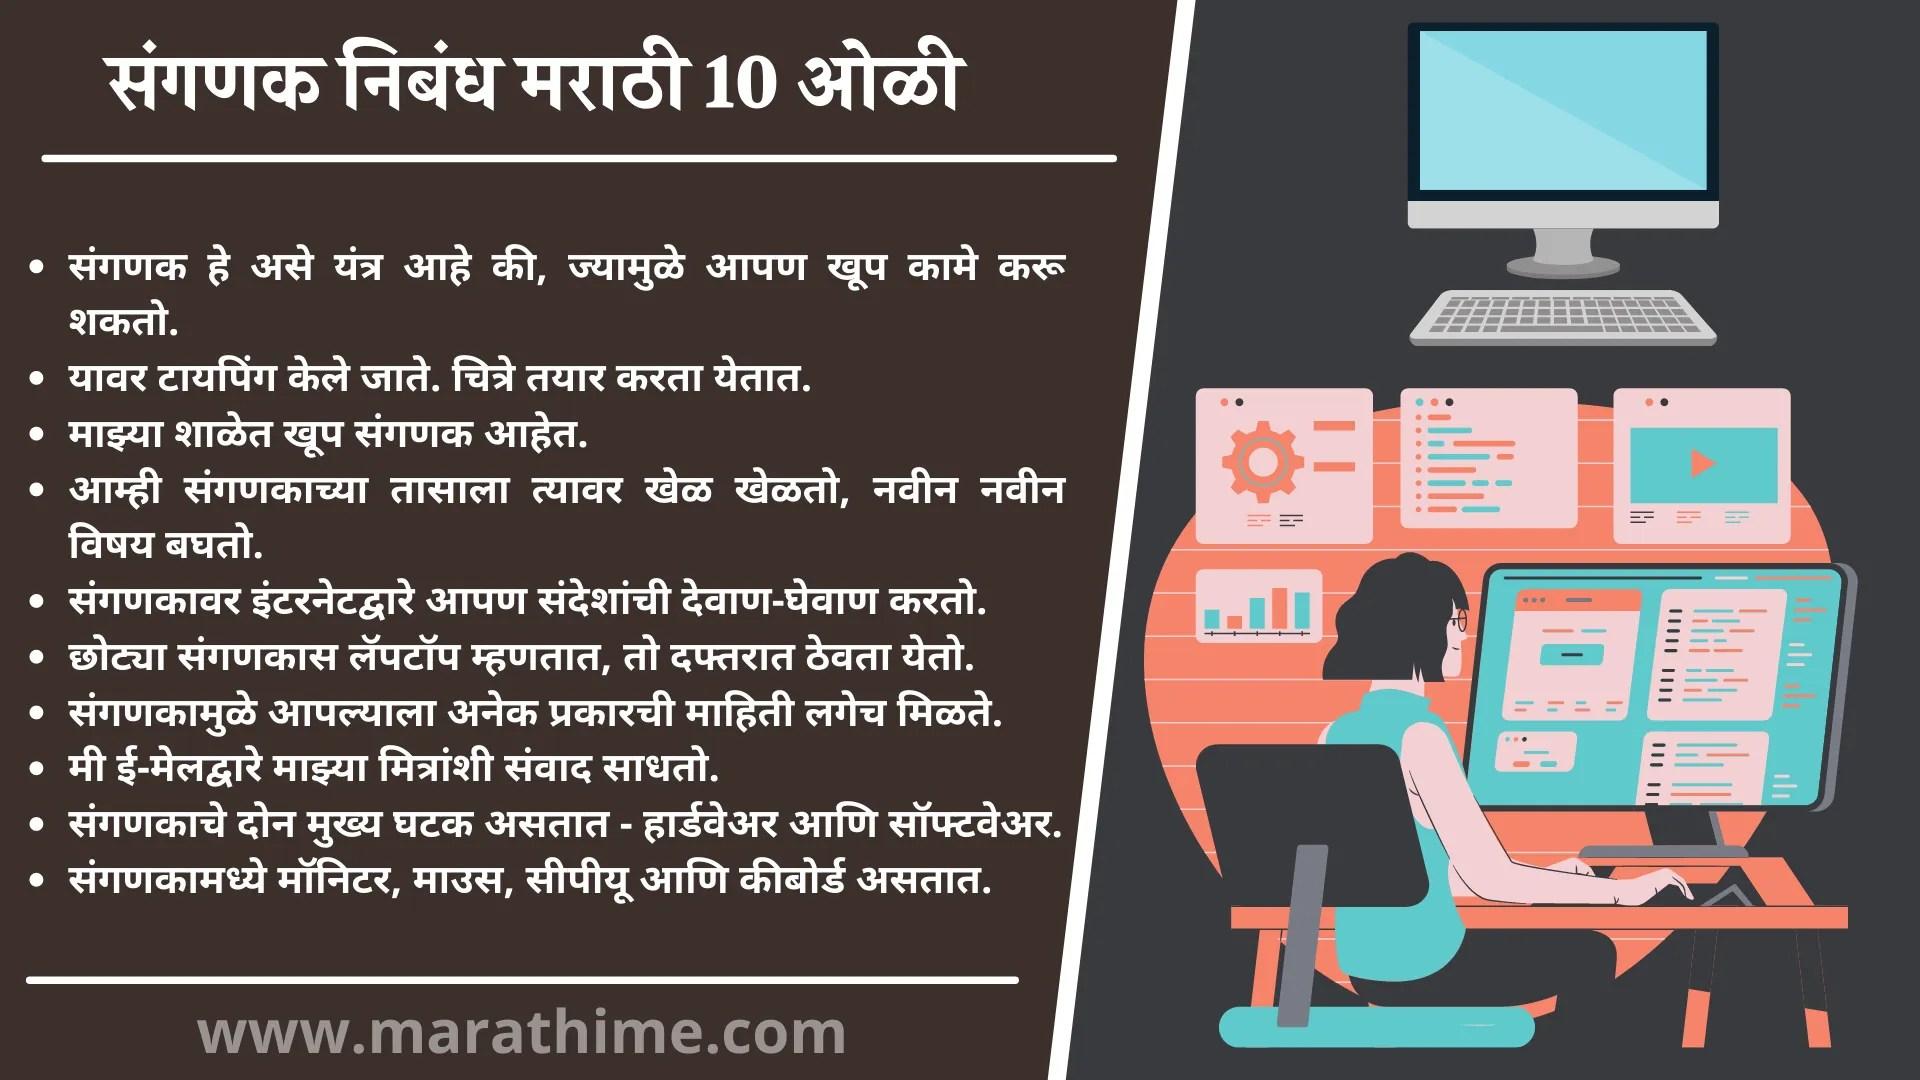 संगणक-निबंध-मराठी-10-ओळी-10-Lines-on-Computer-in-Marathi